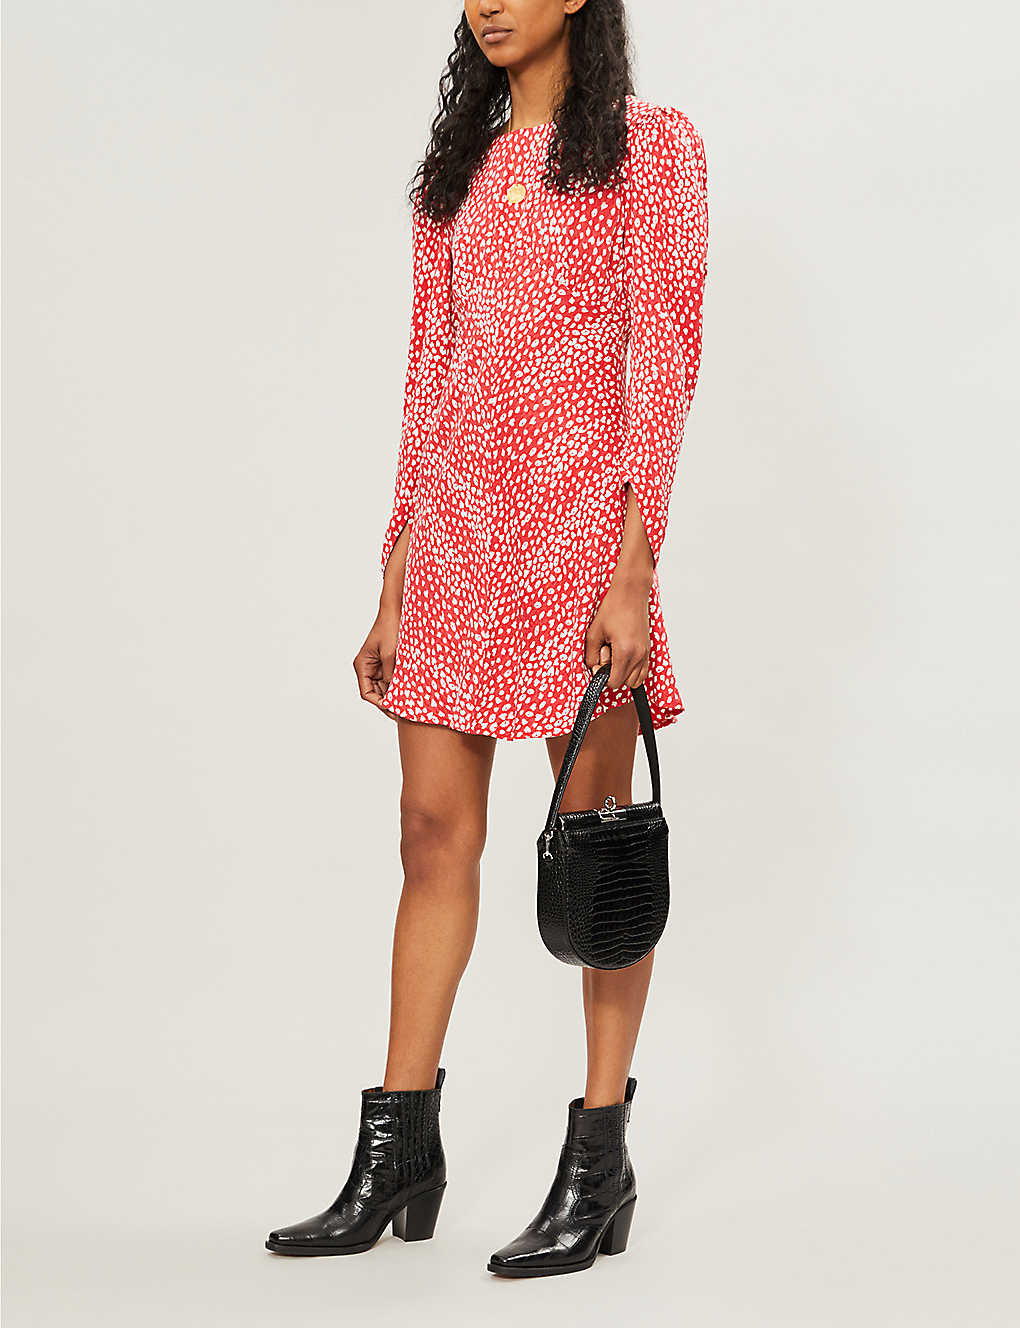 Romie crepe dress(8123566)